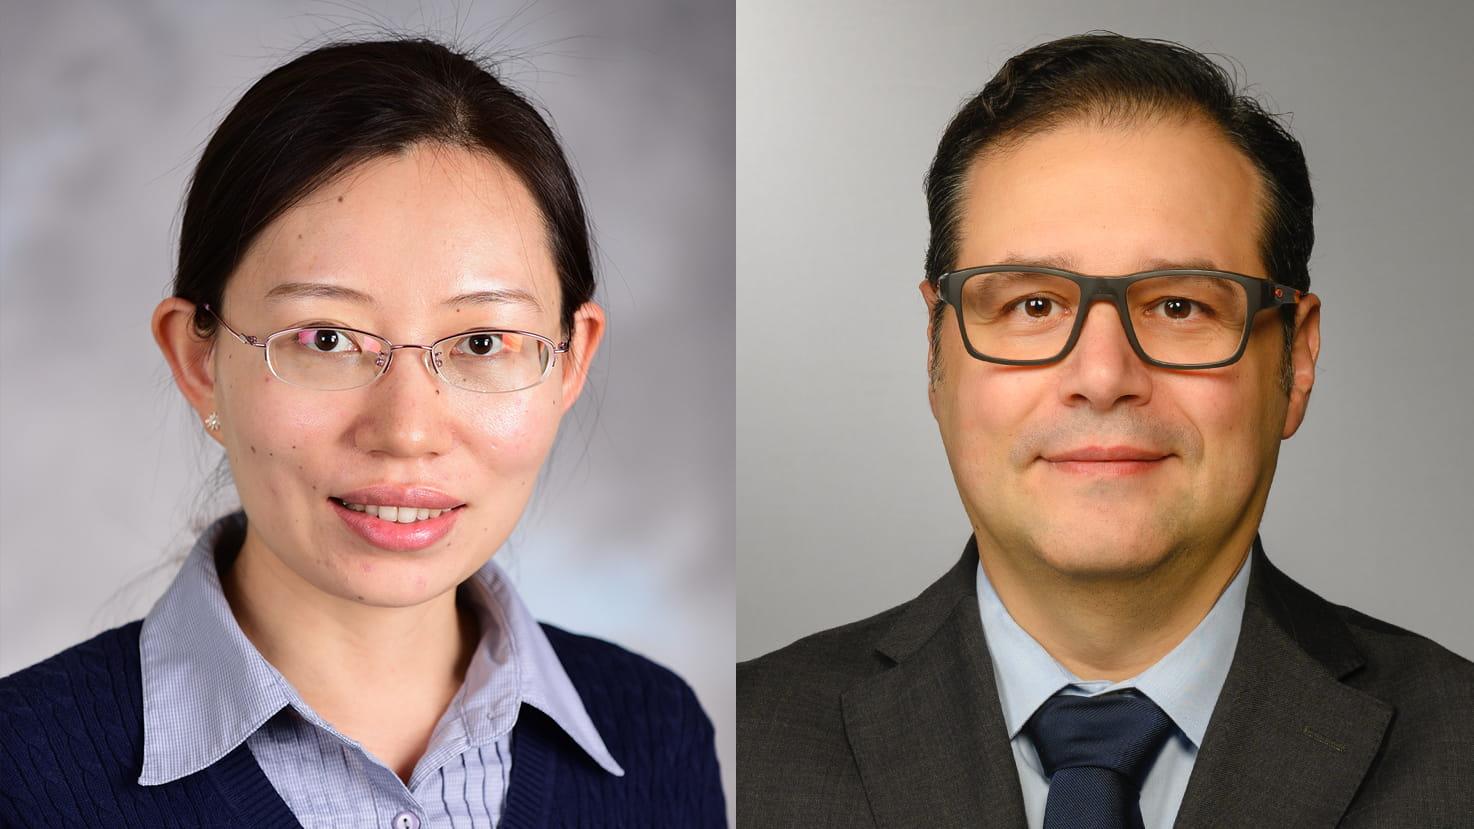 "Liwei Zhang, left, and Luca Maddalena"" width=""1474"" src=""https://cdn.web.uta.edu/-/media/project/website/news/releases/2020/08/zhang-maddalena.ashx?la=en&h=829&w=1474"" _languageinserted=""true"